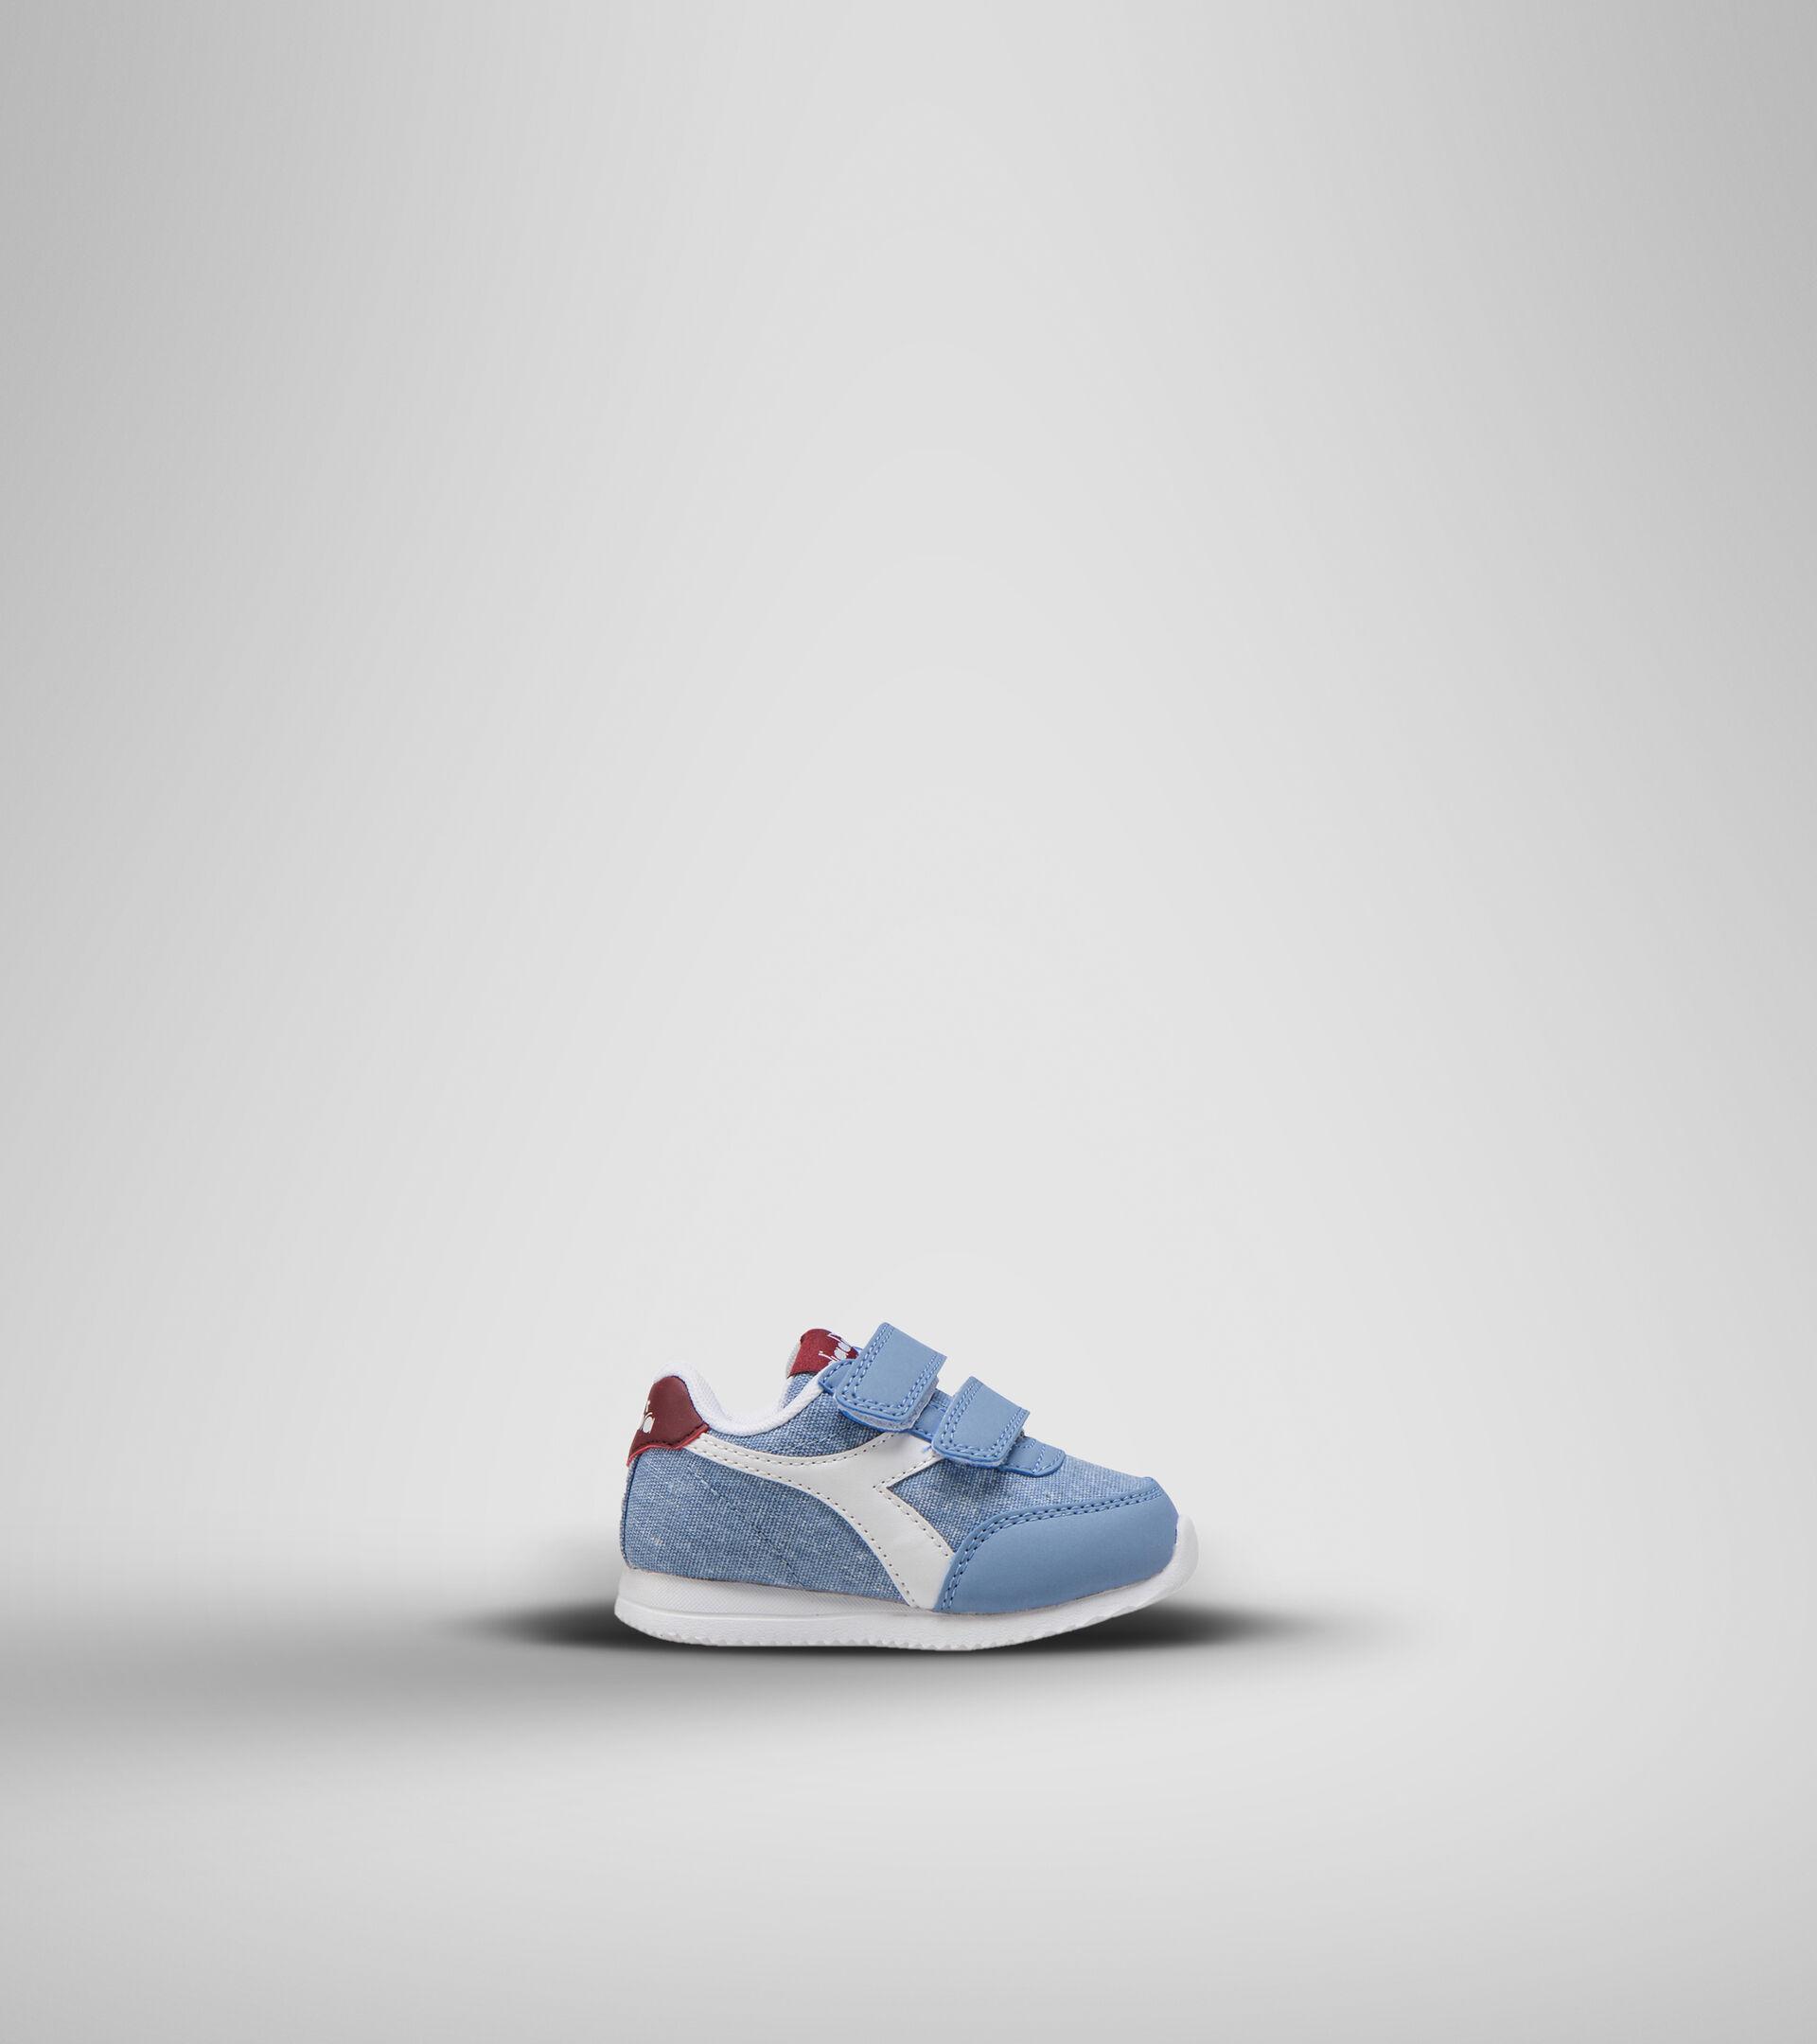 Sports shoes - Toddlers 1-4 years JOG LIGHT TD FADED DENIM/ZINFANDEL - Diadora